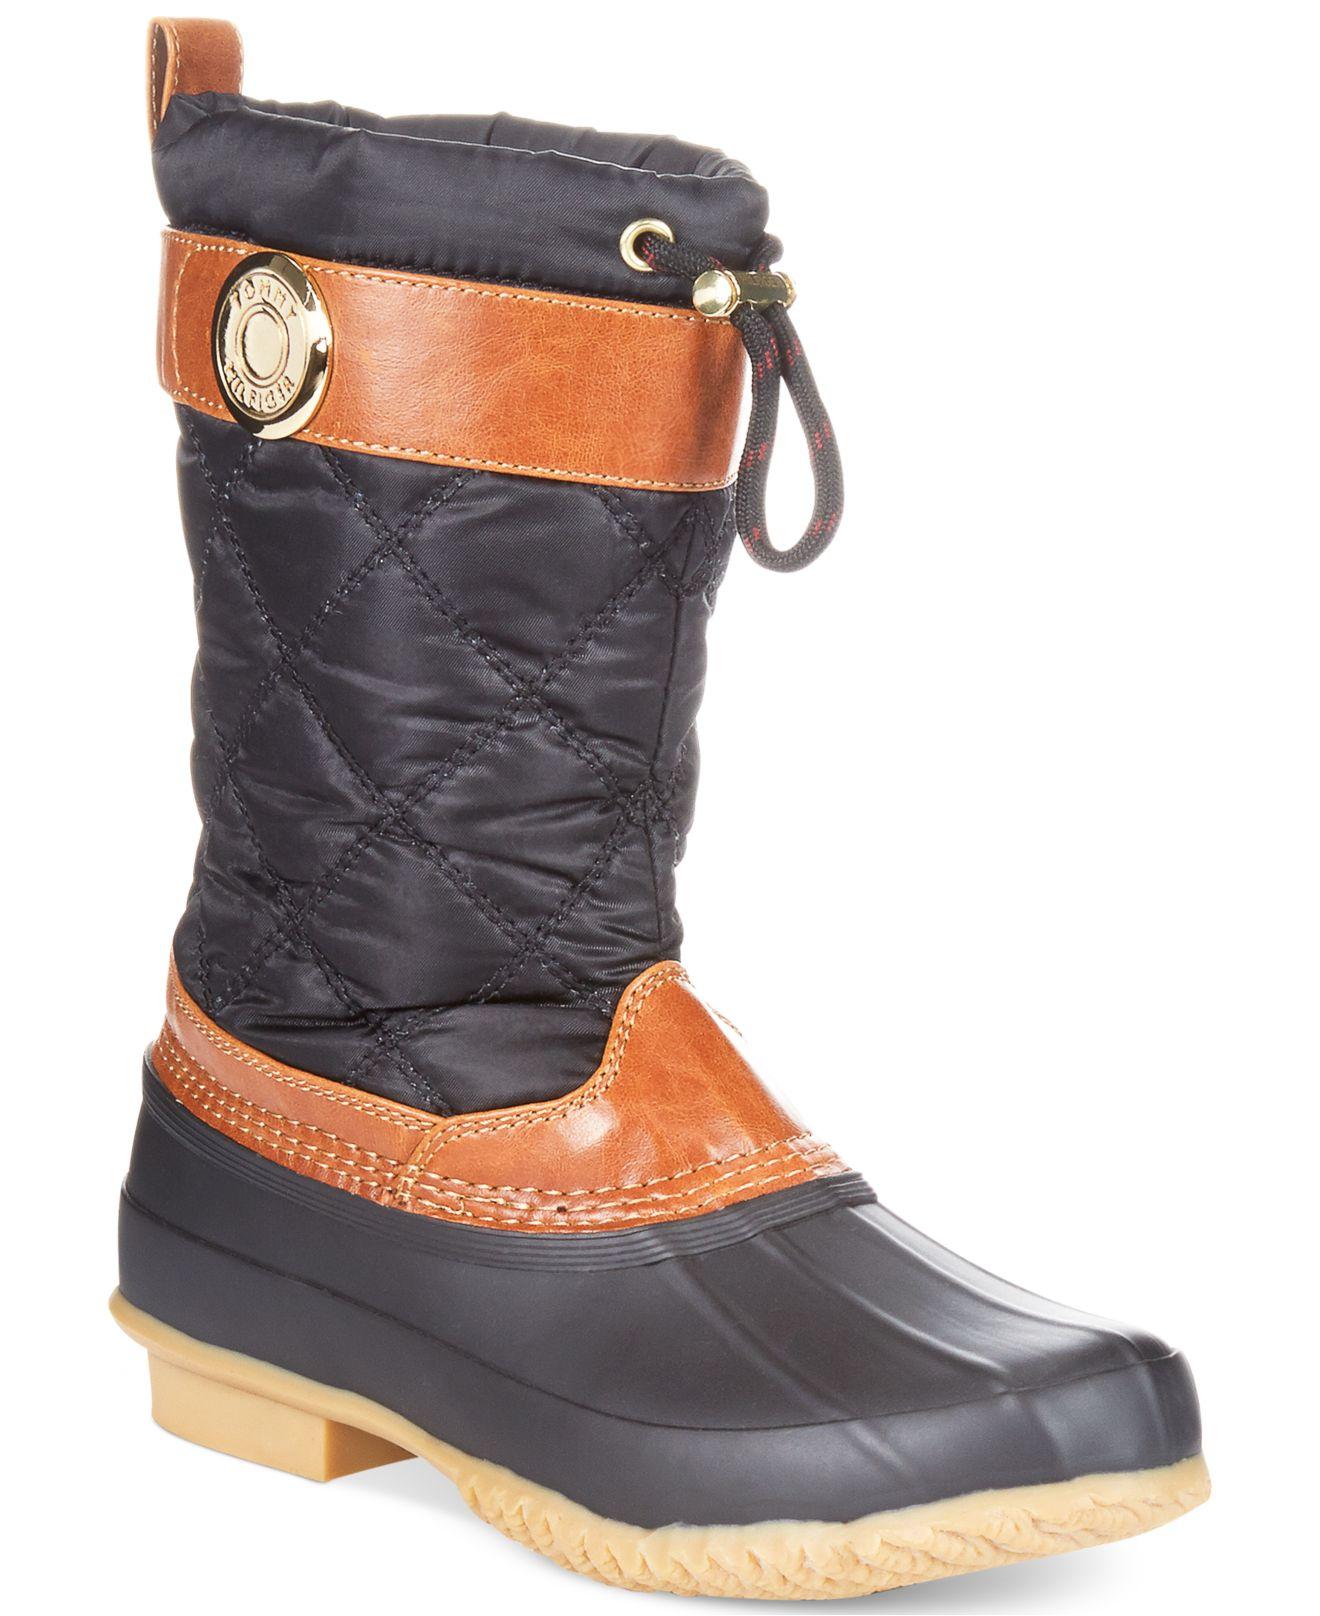 60b2860fa Lyst - Tommy Hilfiger Women s Arcadia Duck Boots in Black